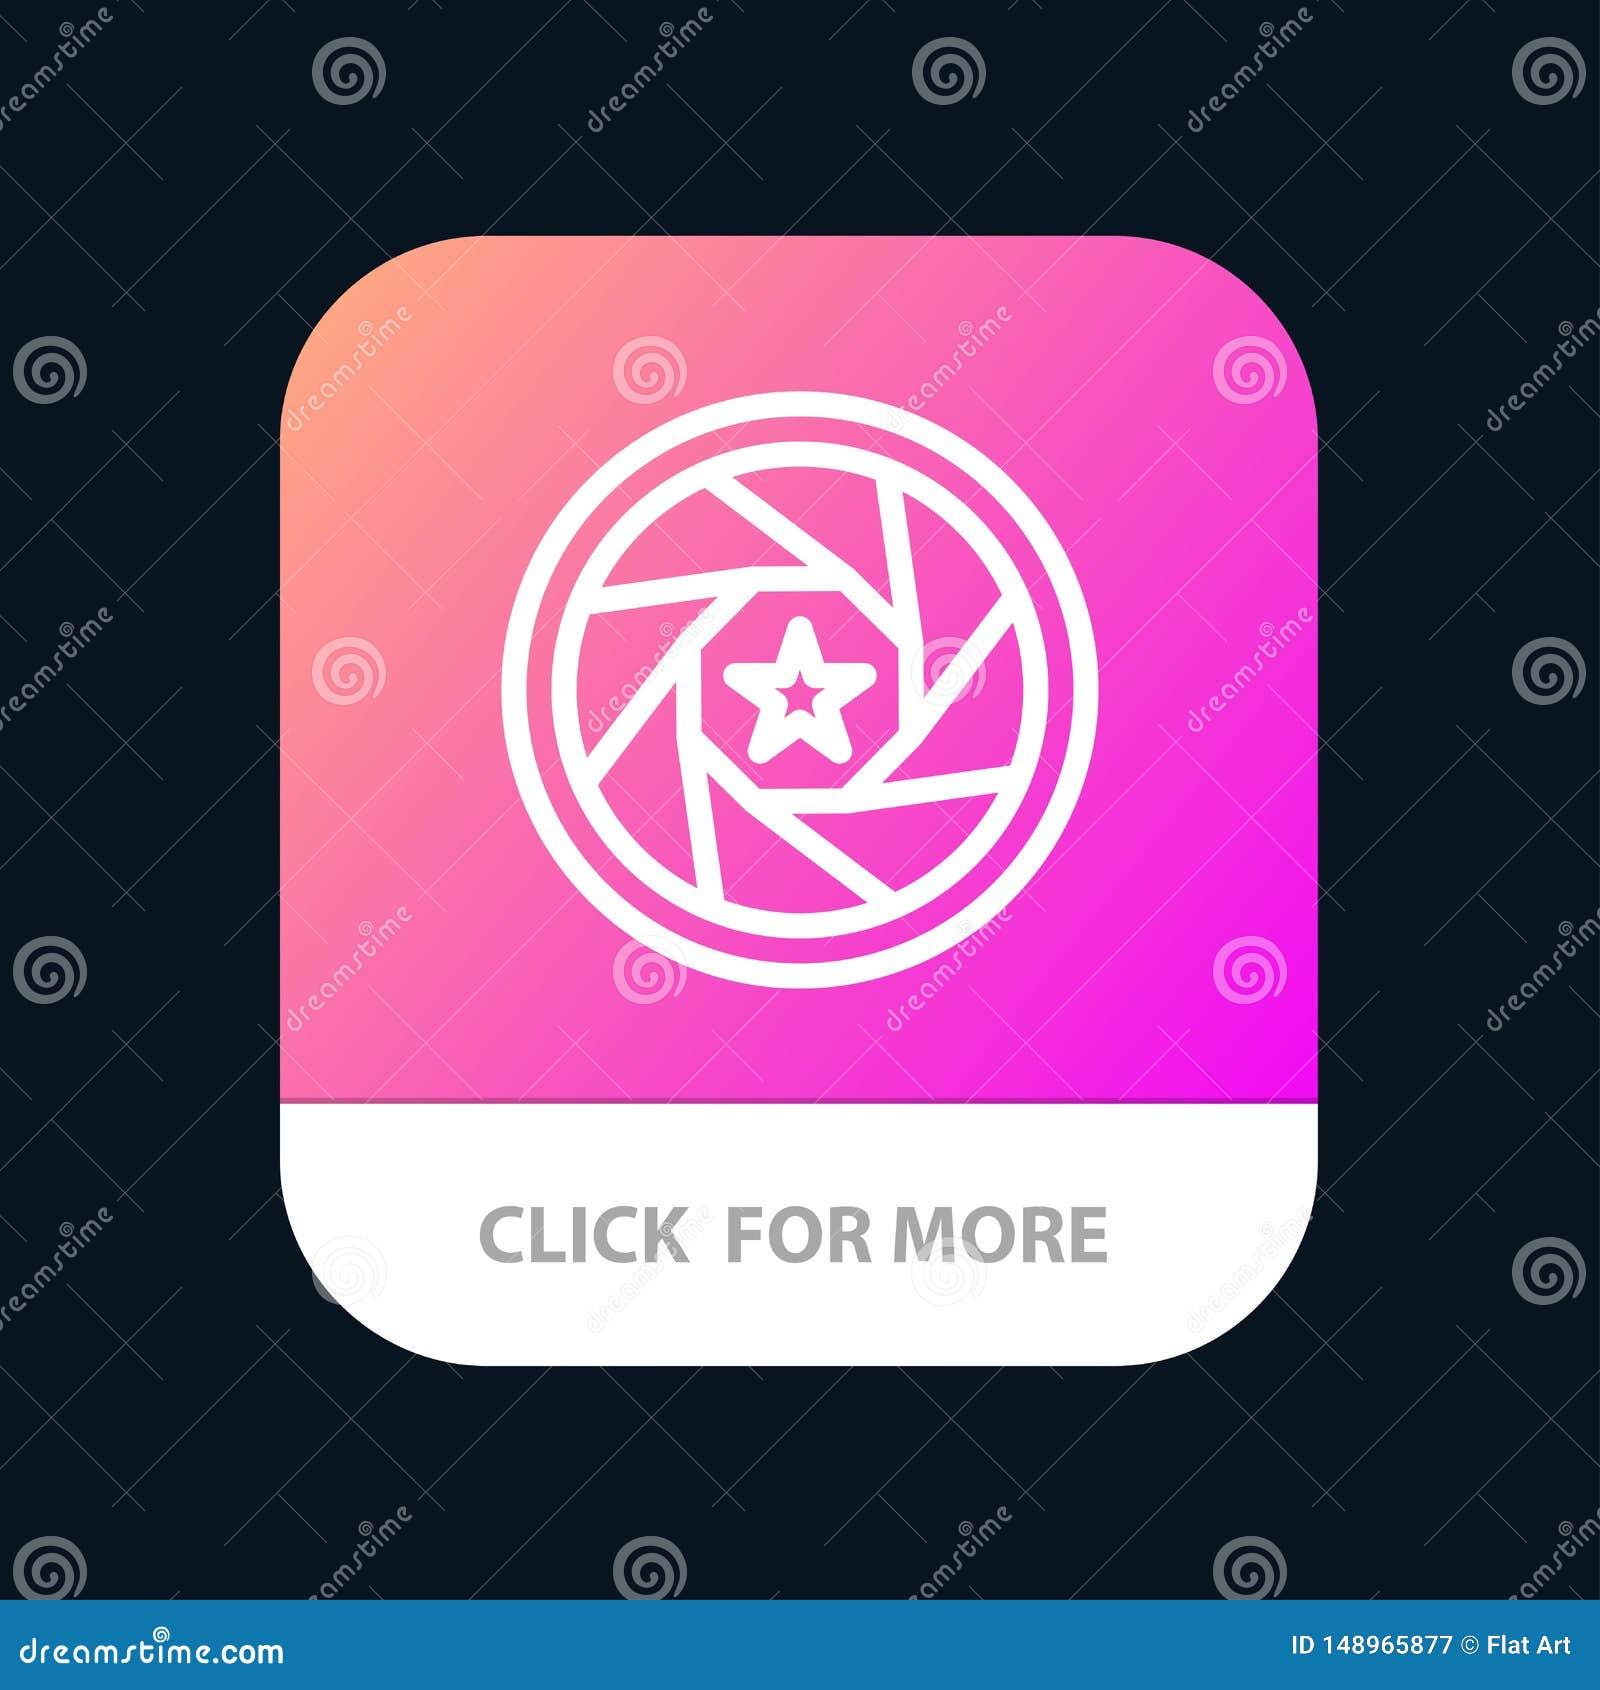 Apertura, film, logo, film, fotografii App Mobilny guzik Android i IOS linii wersja